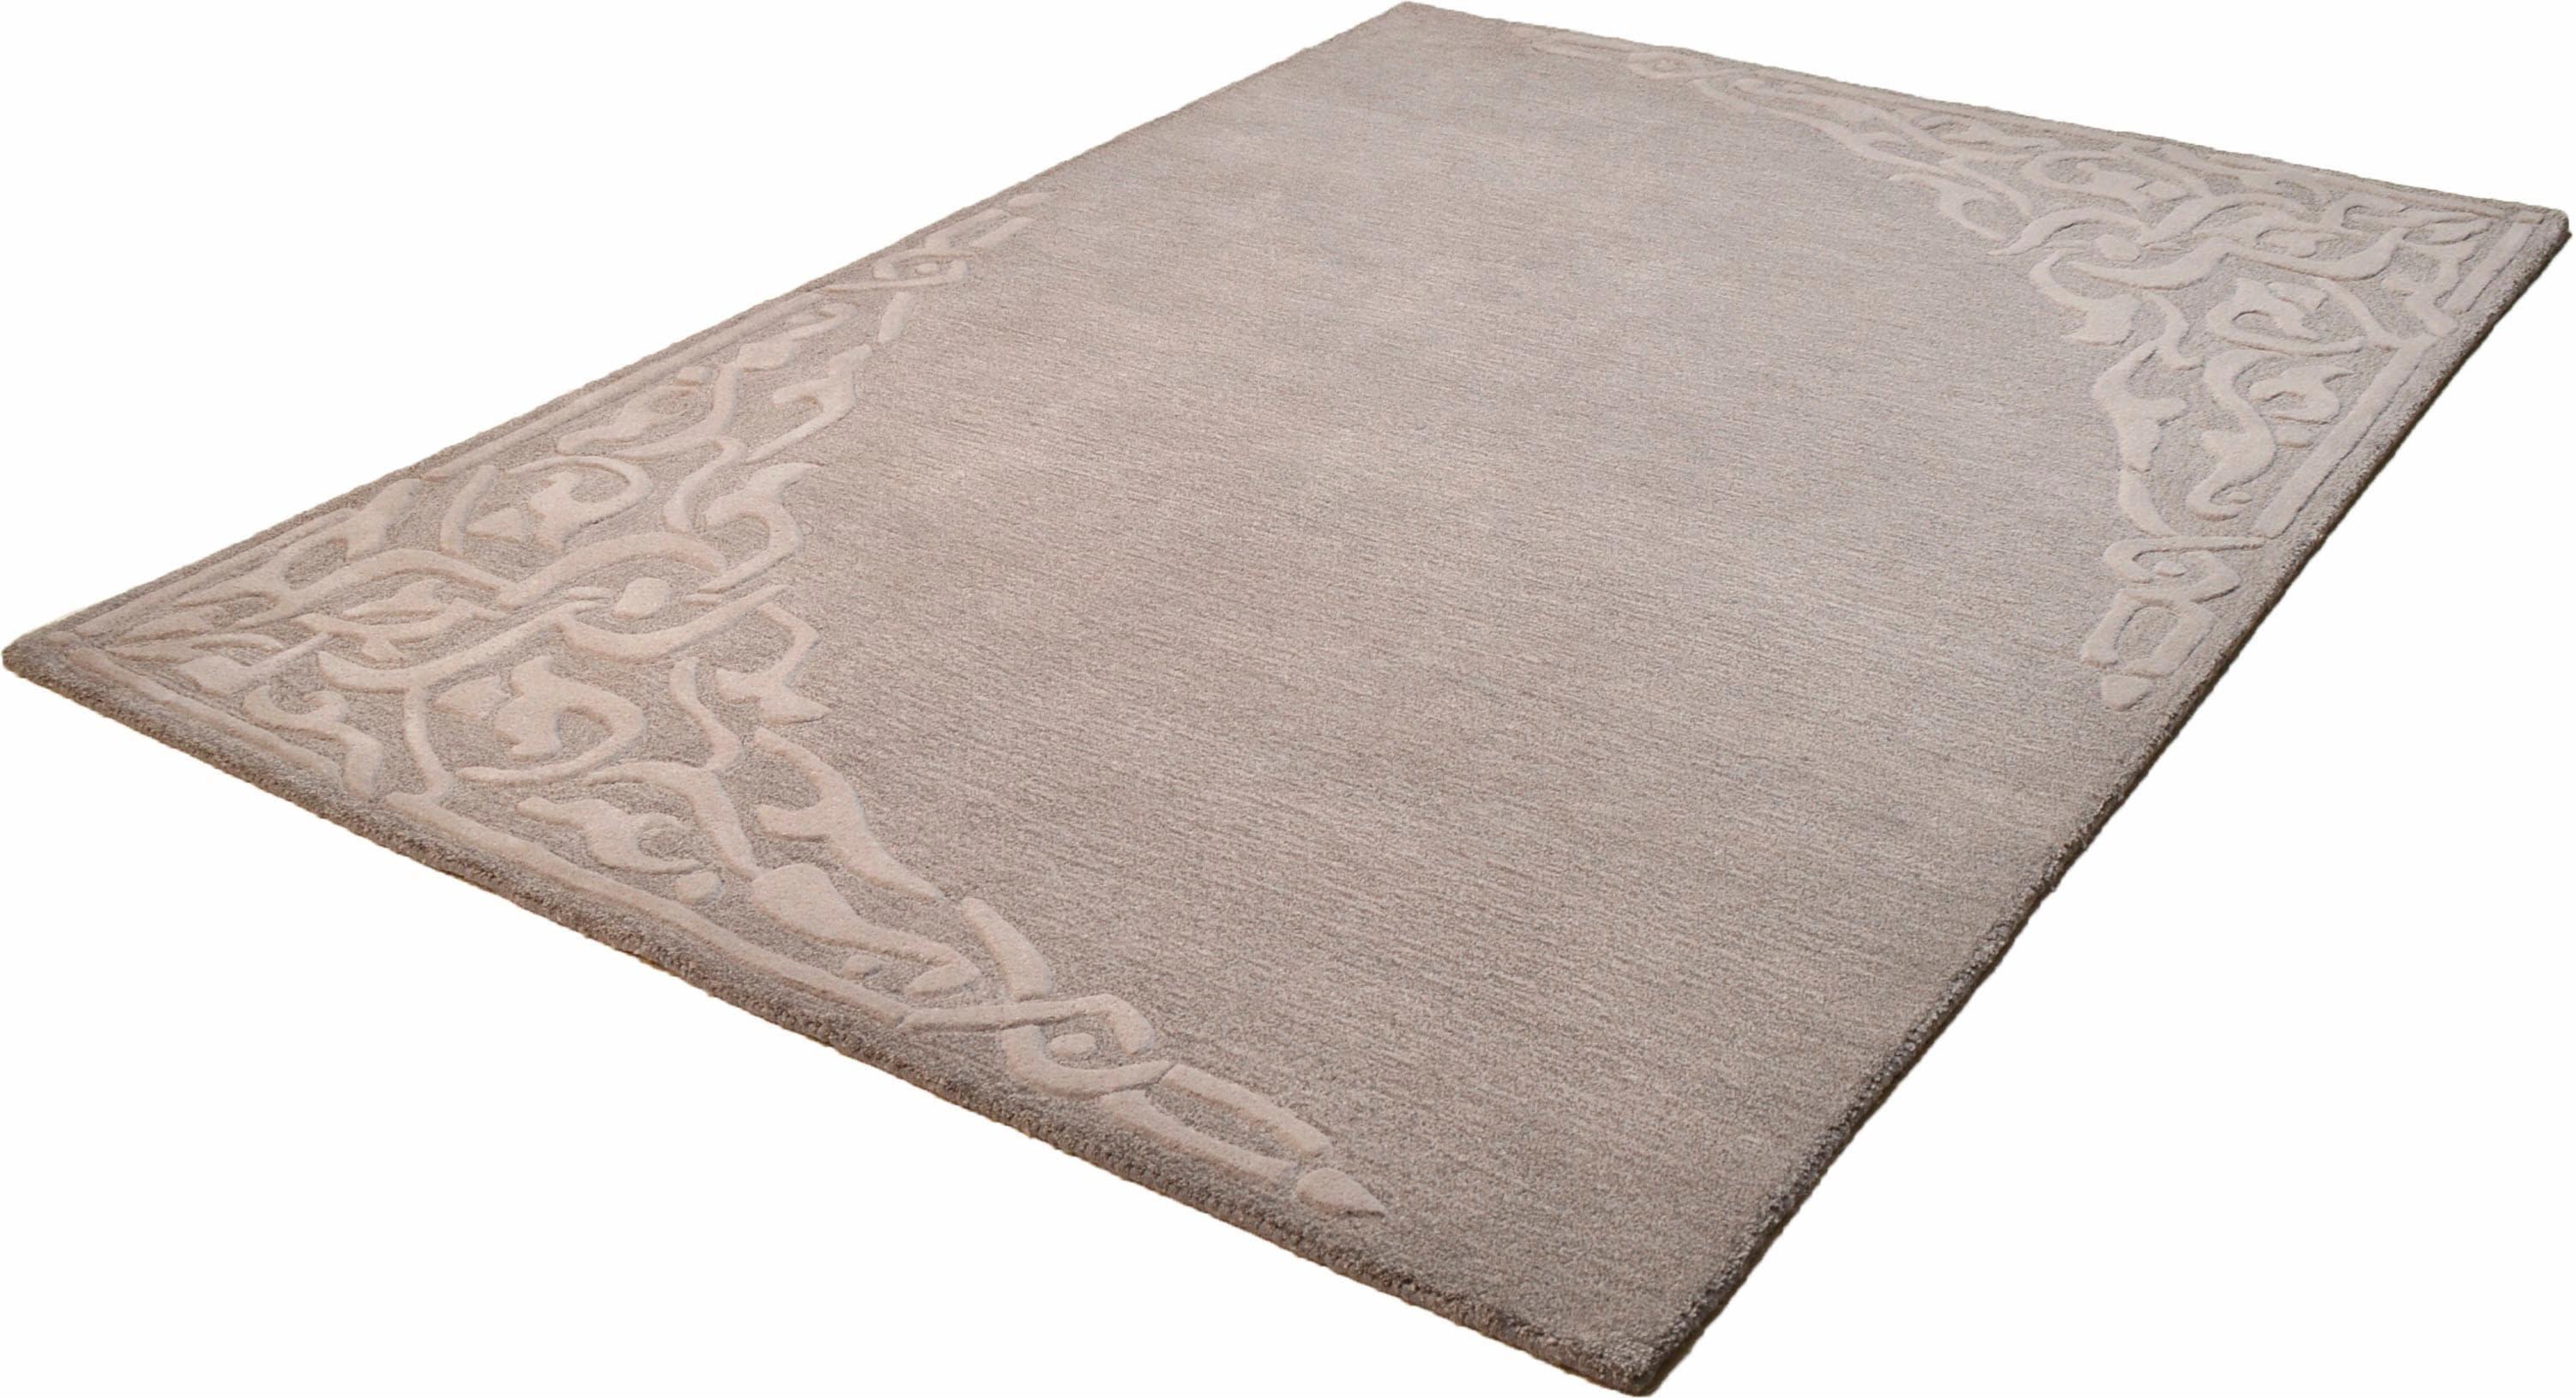 Teppich Aloha 8101 THEKO rechteckig Höhe 10 mm handgetuftet